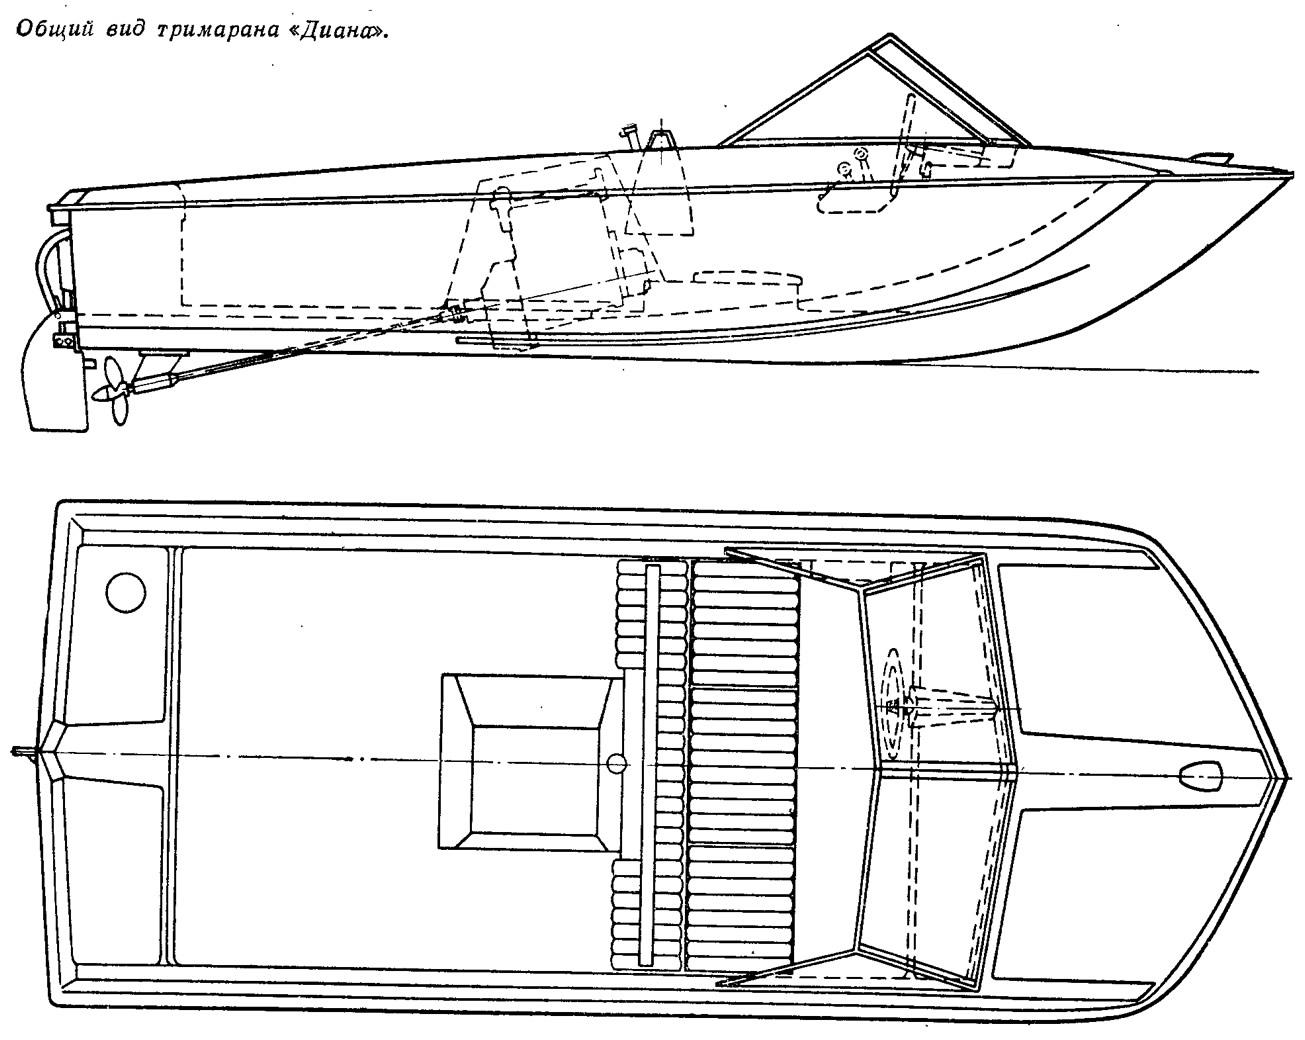 Общий вид тримарана «Диана»